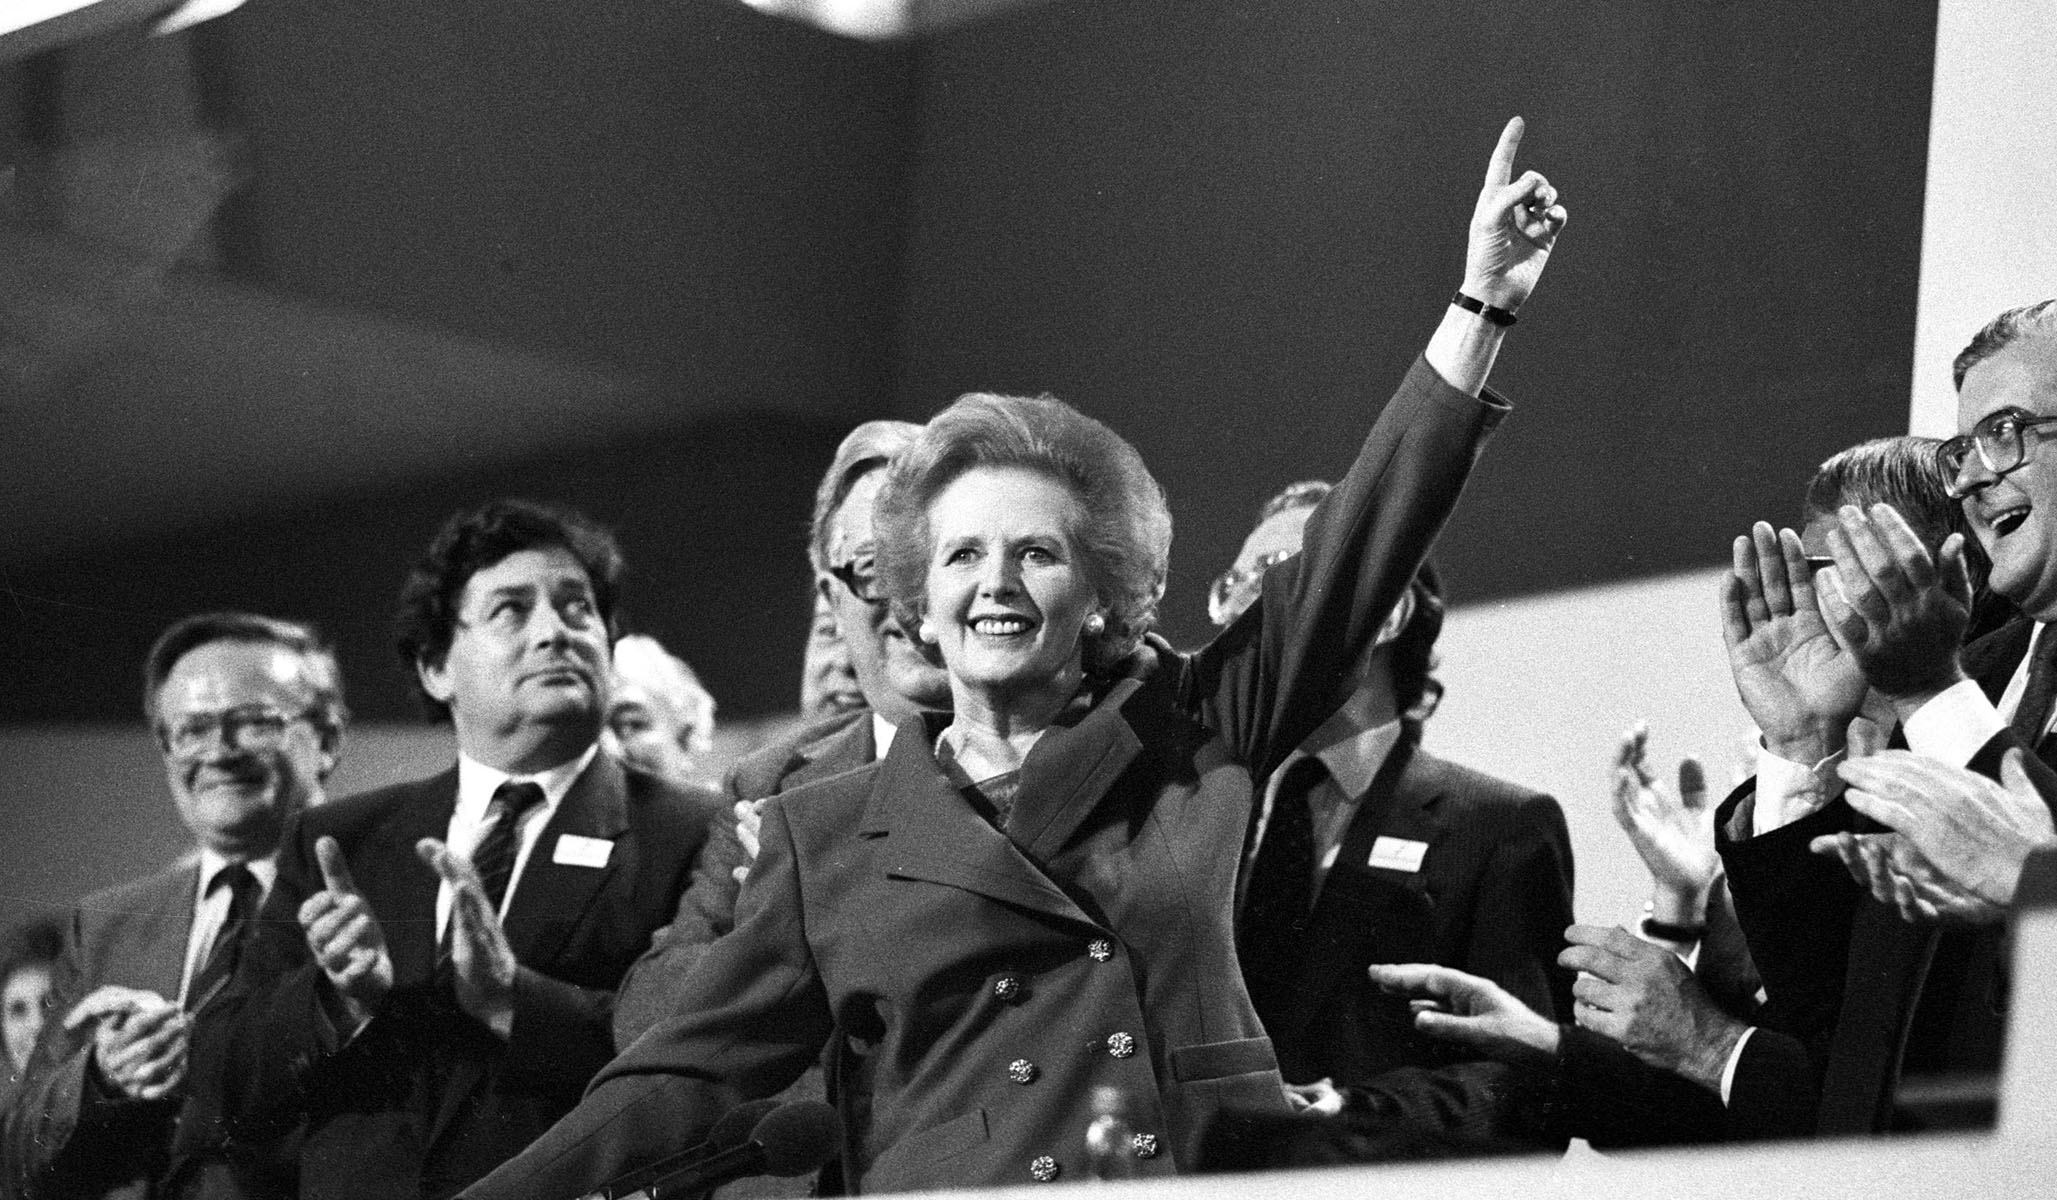 When did Conservative Euroskepticism Begin?